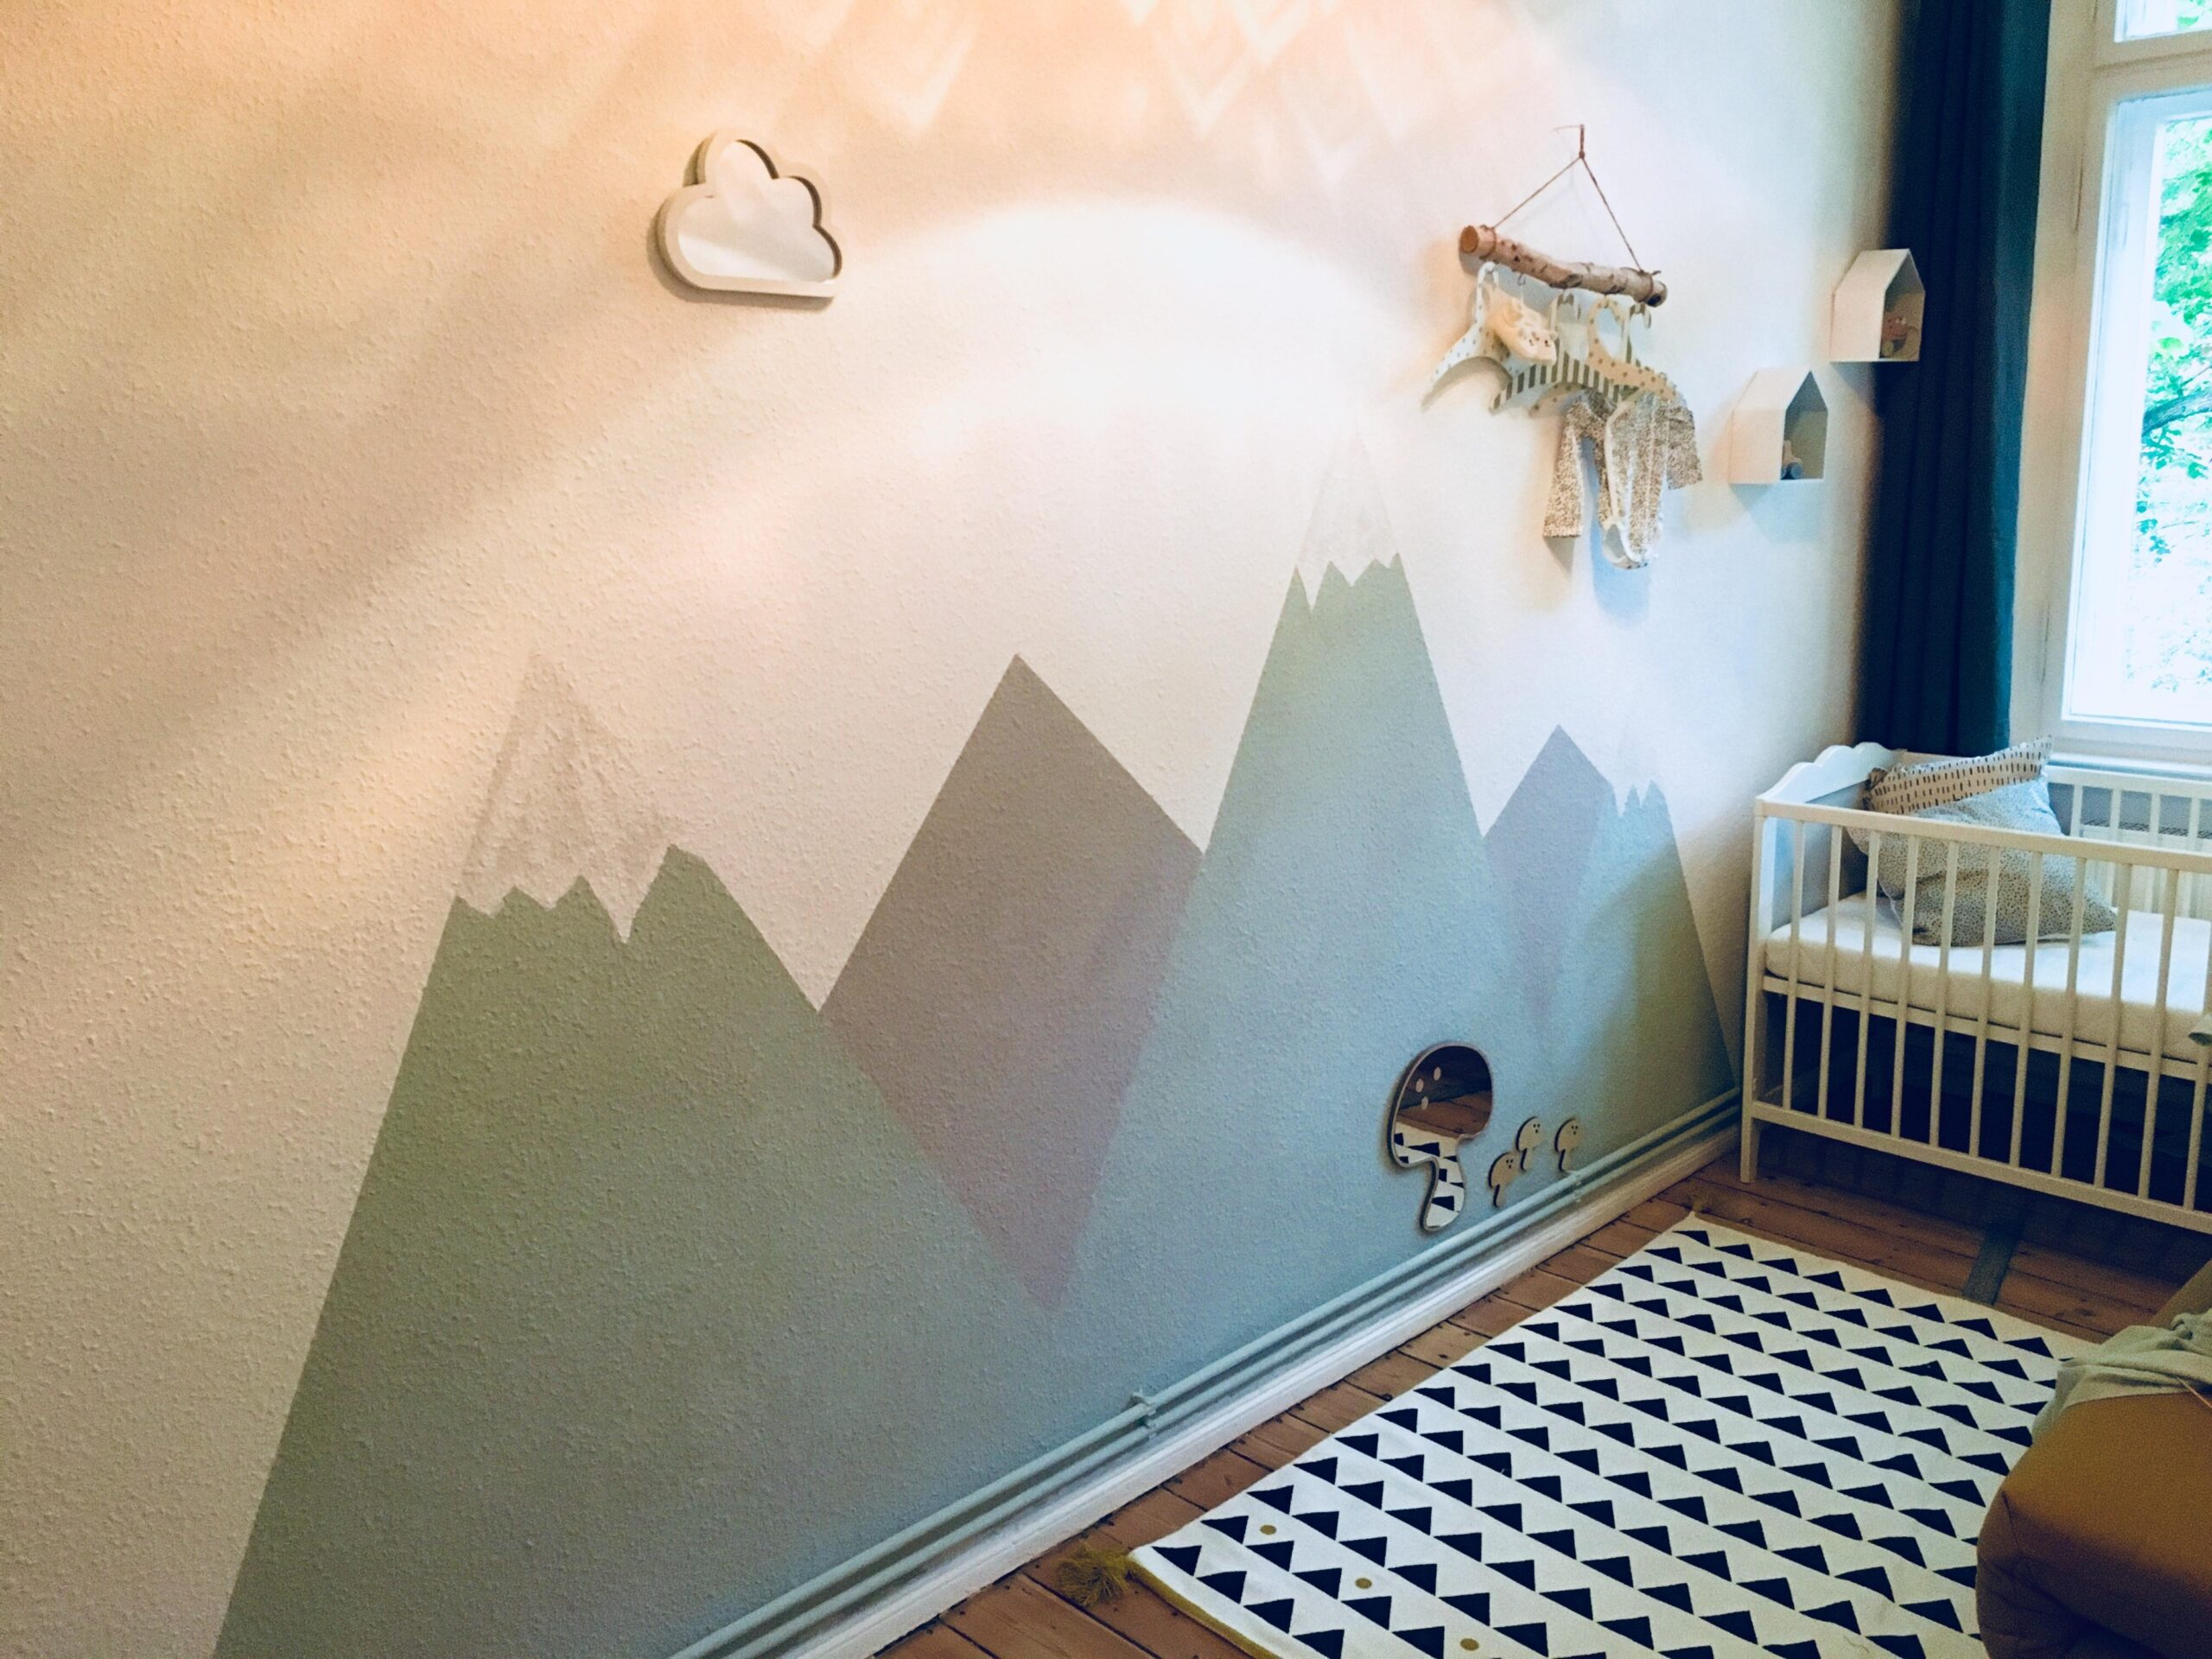 Full Size of Wandgestaltung Kinderzimmer Jungen Babyzimmer Bilder Ideen Couch Regale Regal Weiß Sofa Wohnzimmer Wandgestaltung Kinderzimmer Jungen